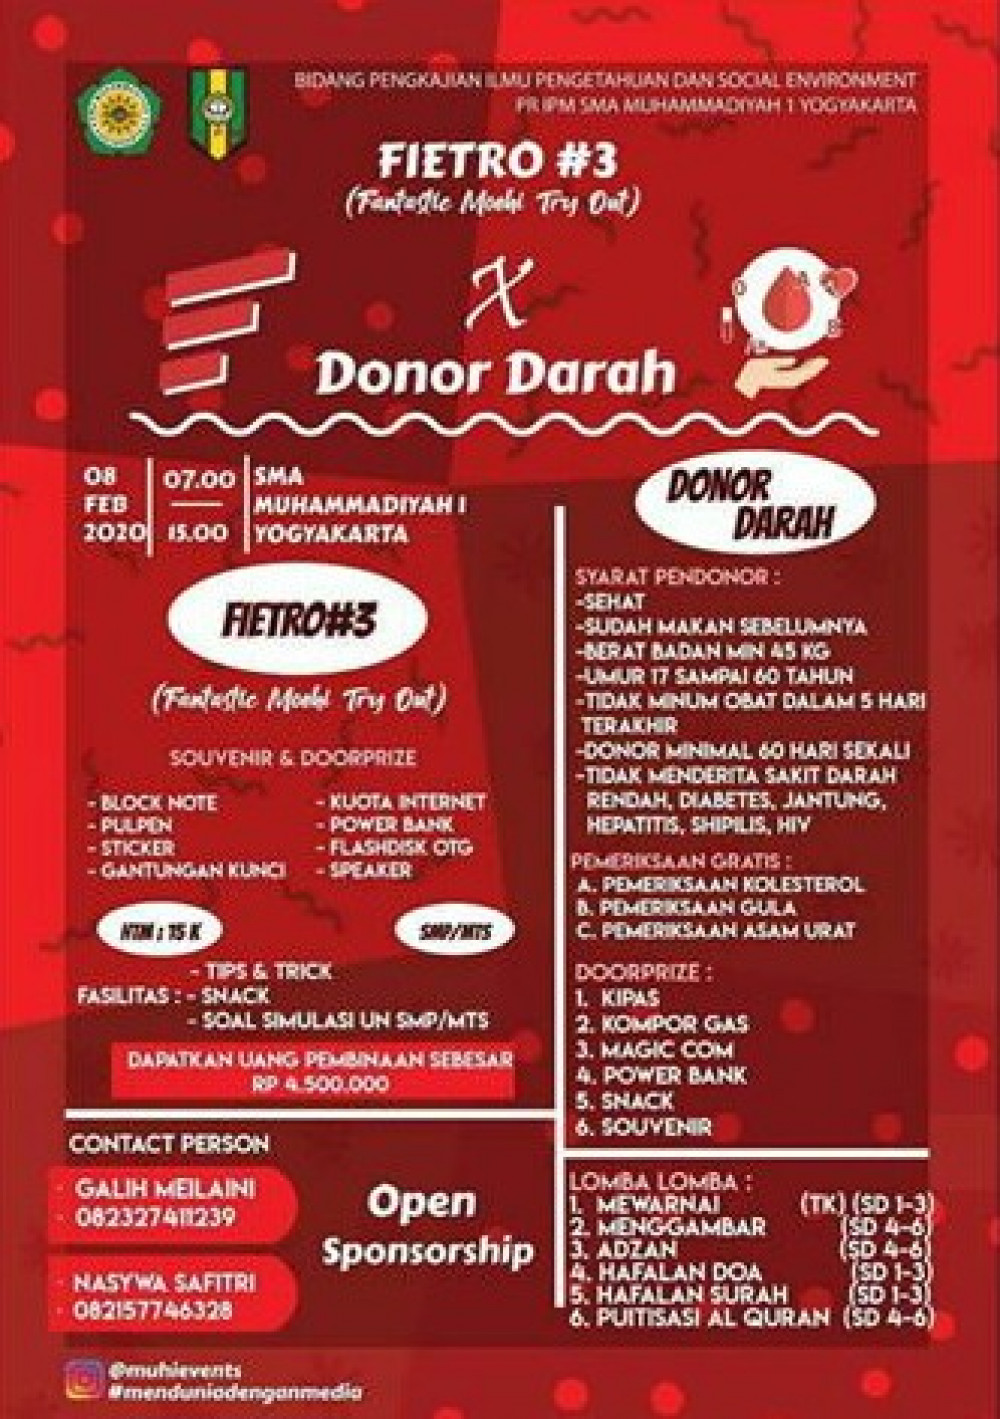 Donor Darah SMA Muhammadiyah 1 Yogyakarta